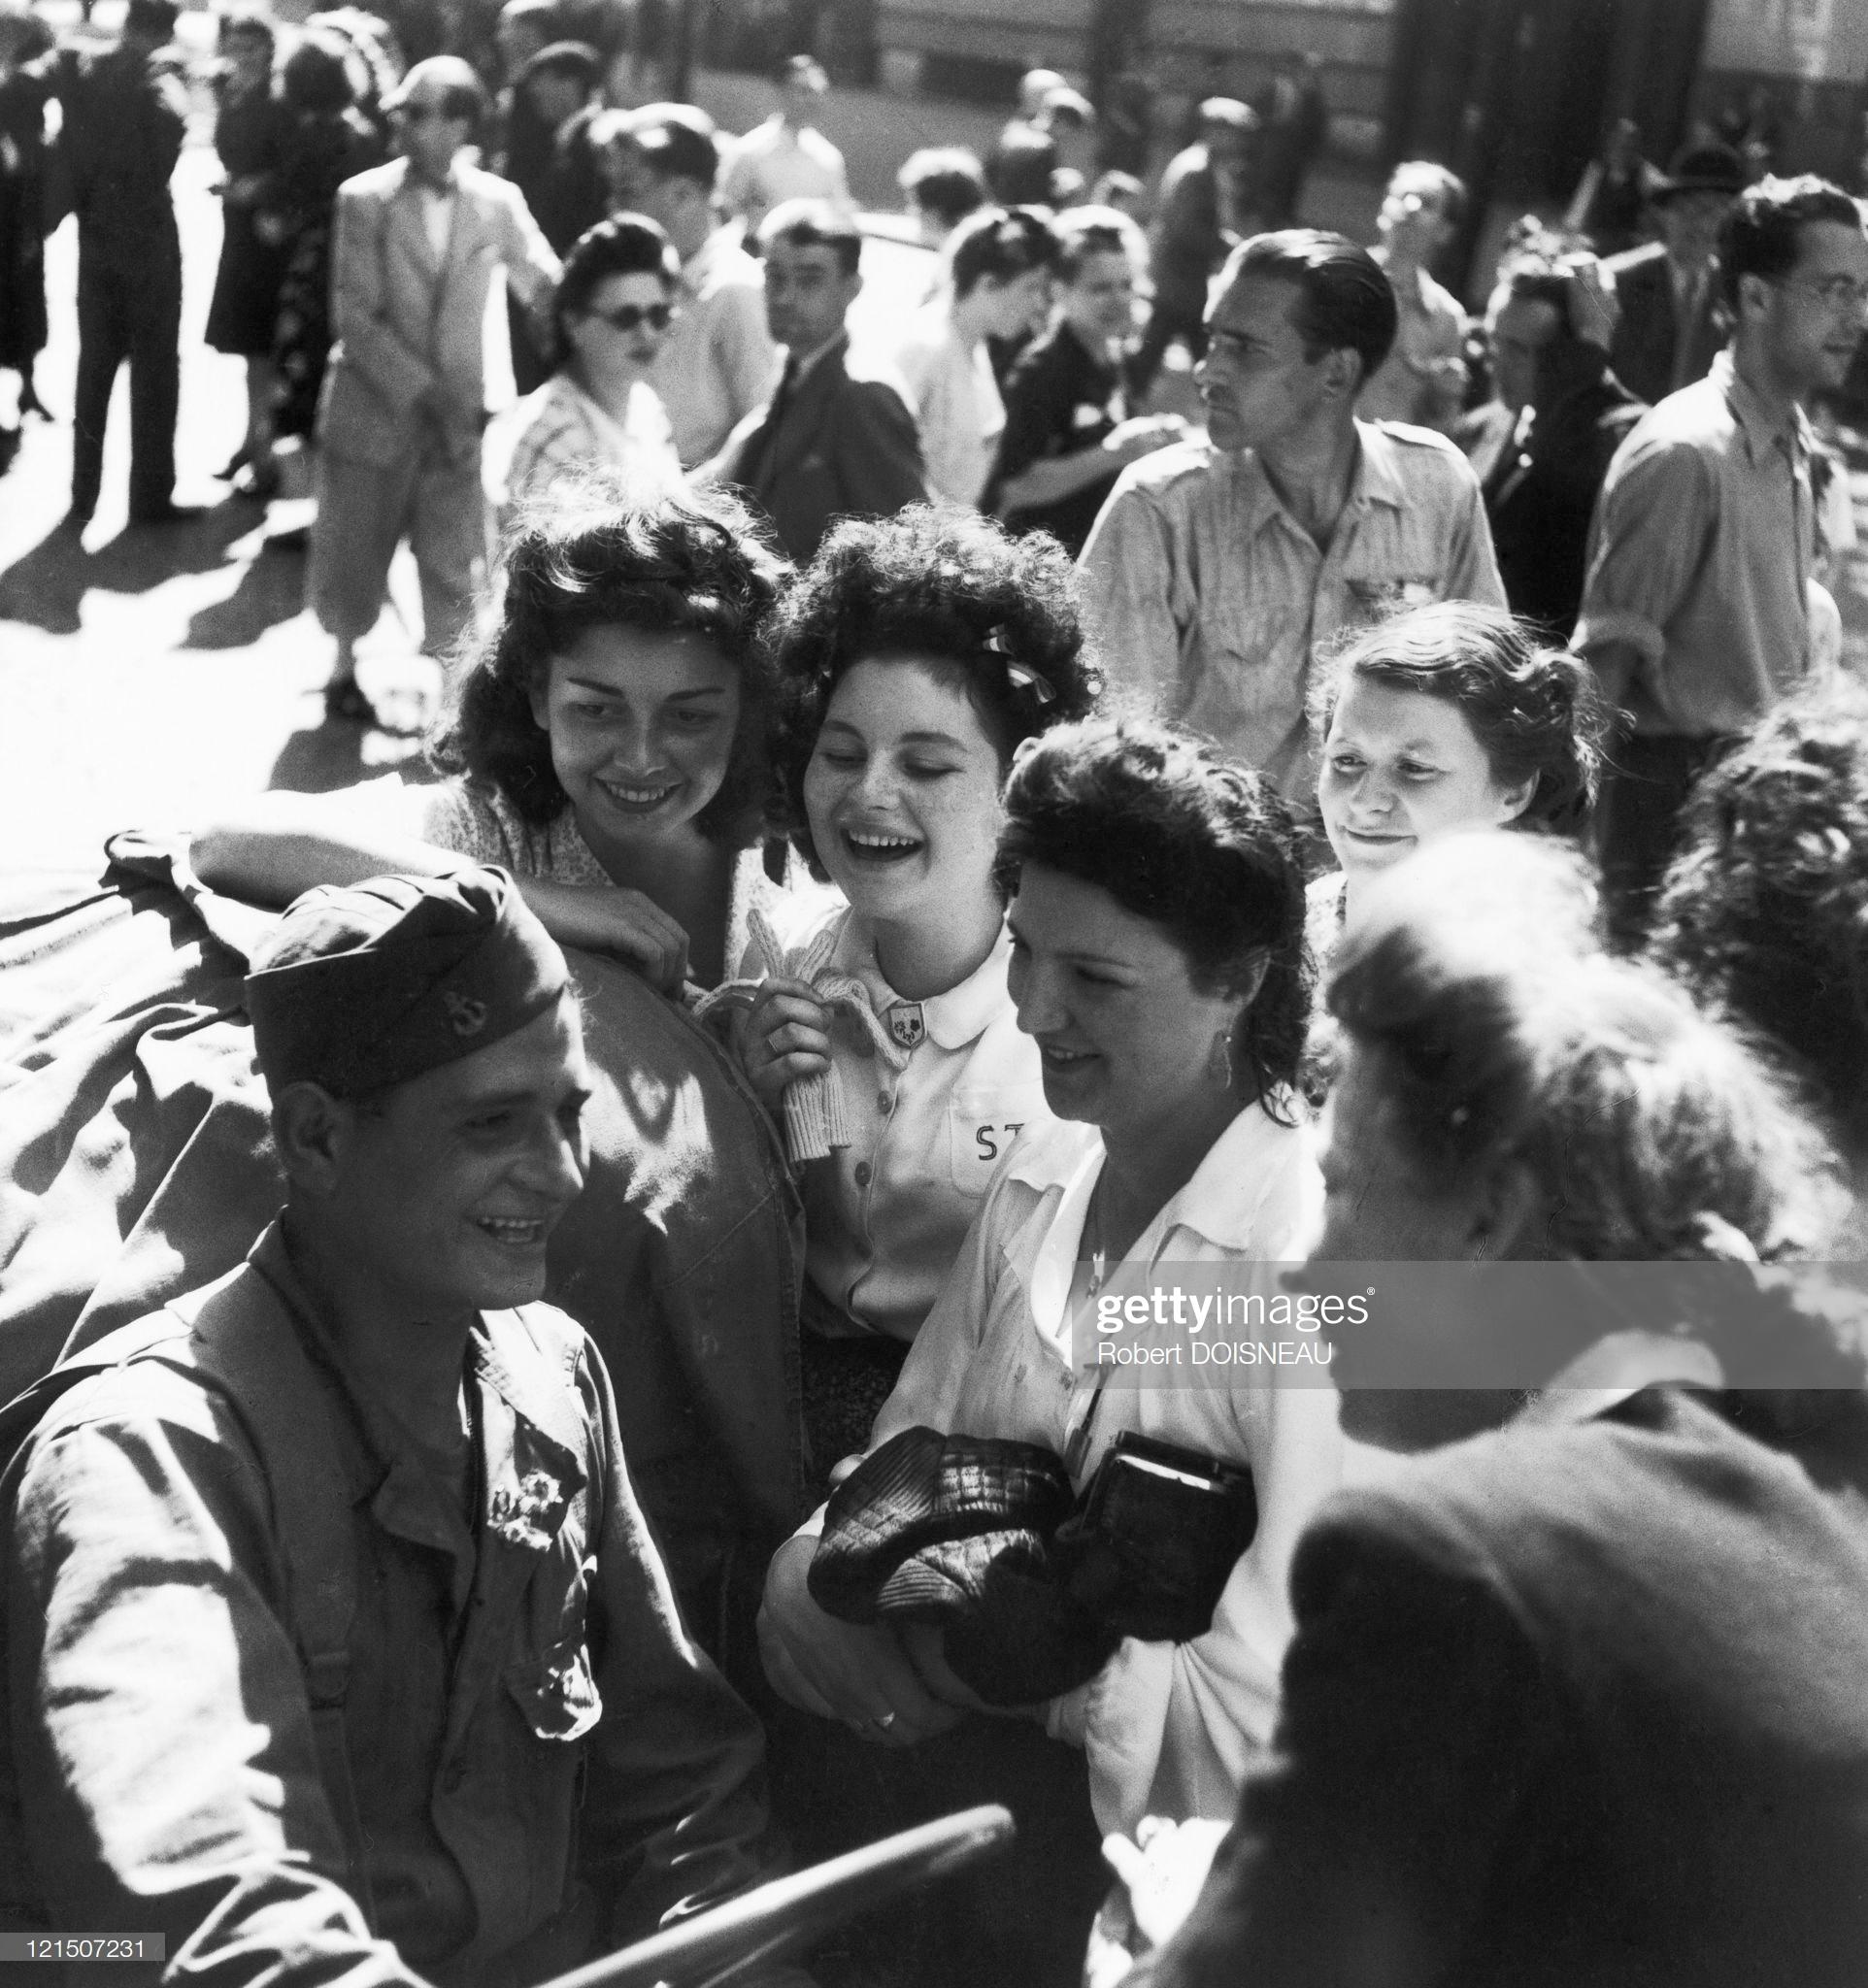 1944. Освобождение Парижа. Парижанки разговаривают с солдатом. 1 августа